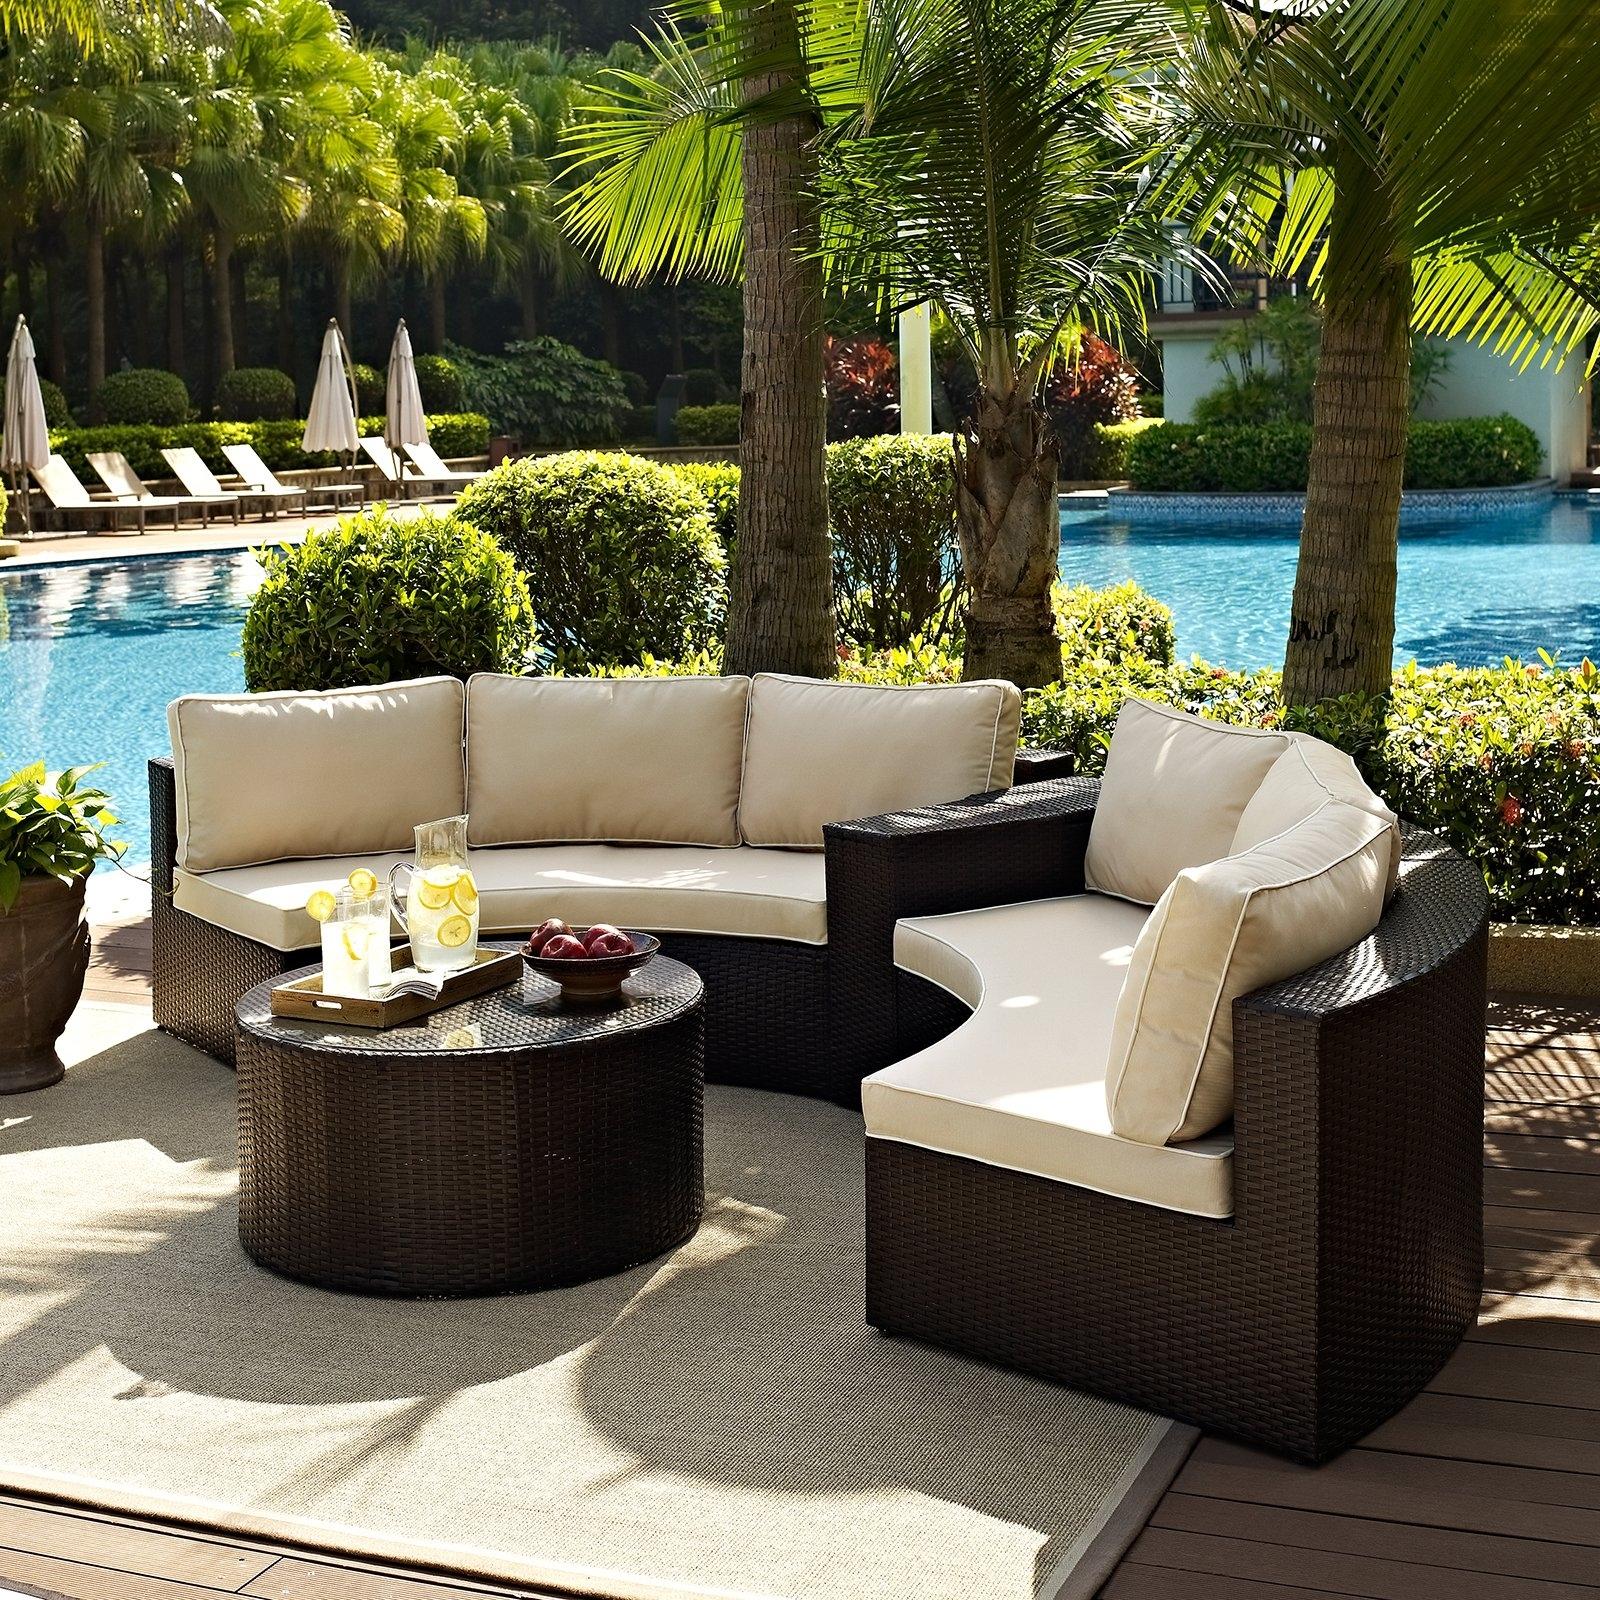 Best And Newest Patio Furniture Walmart Patio Conversation Sets Walmart Sams Club For Walmart Patio Furniture Conversation Sets (View 12 of 15)